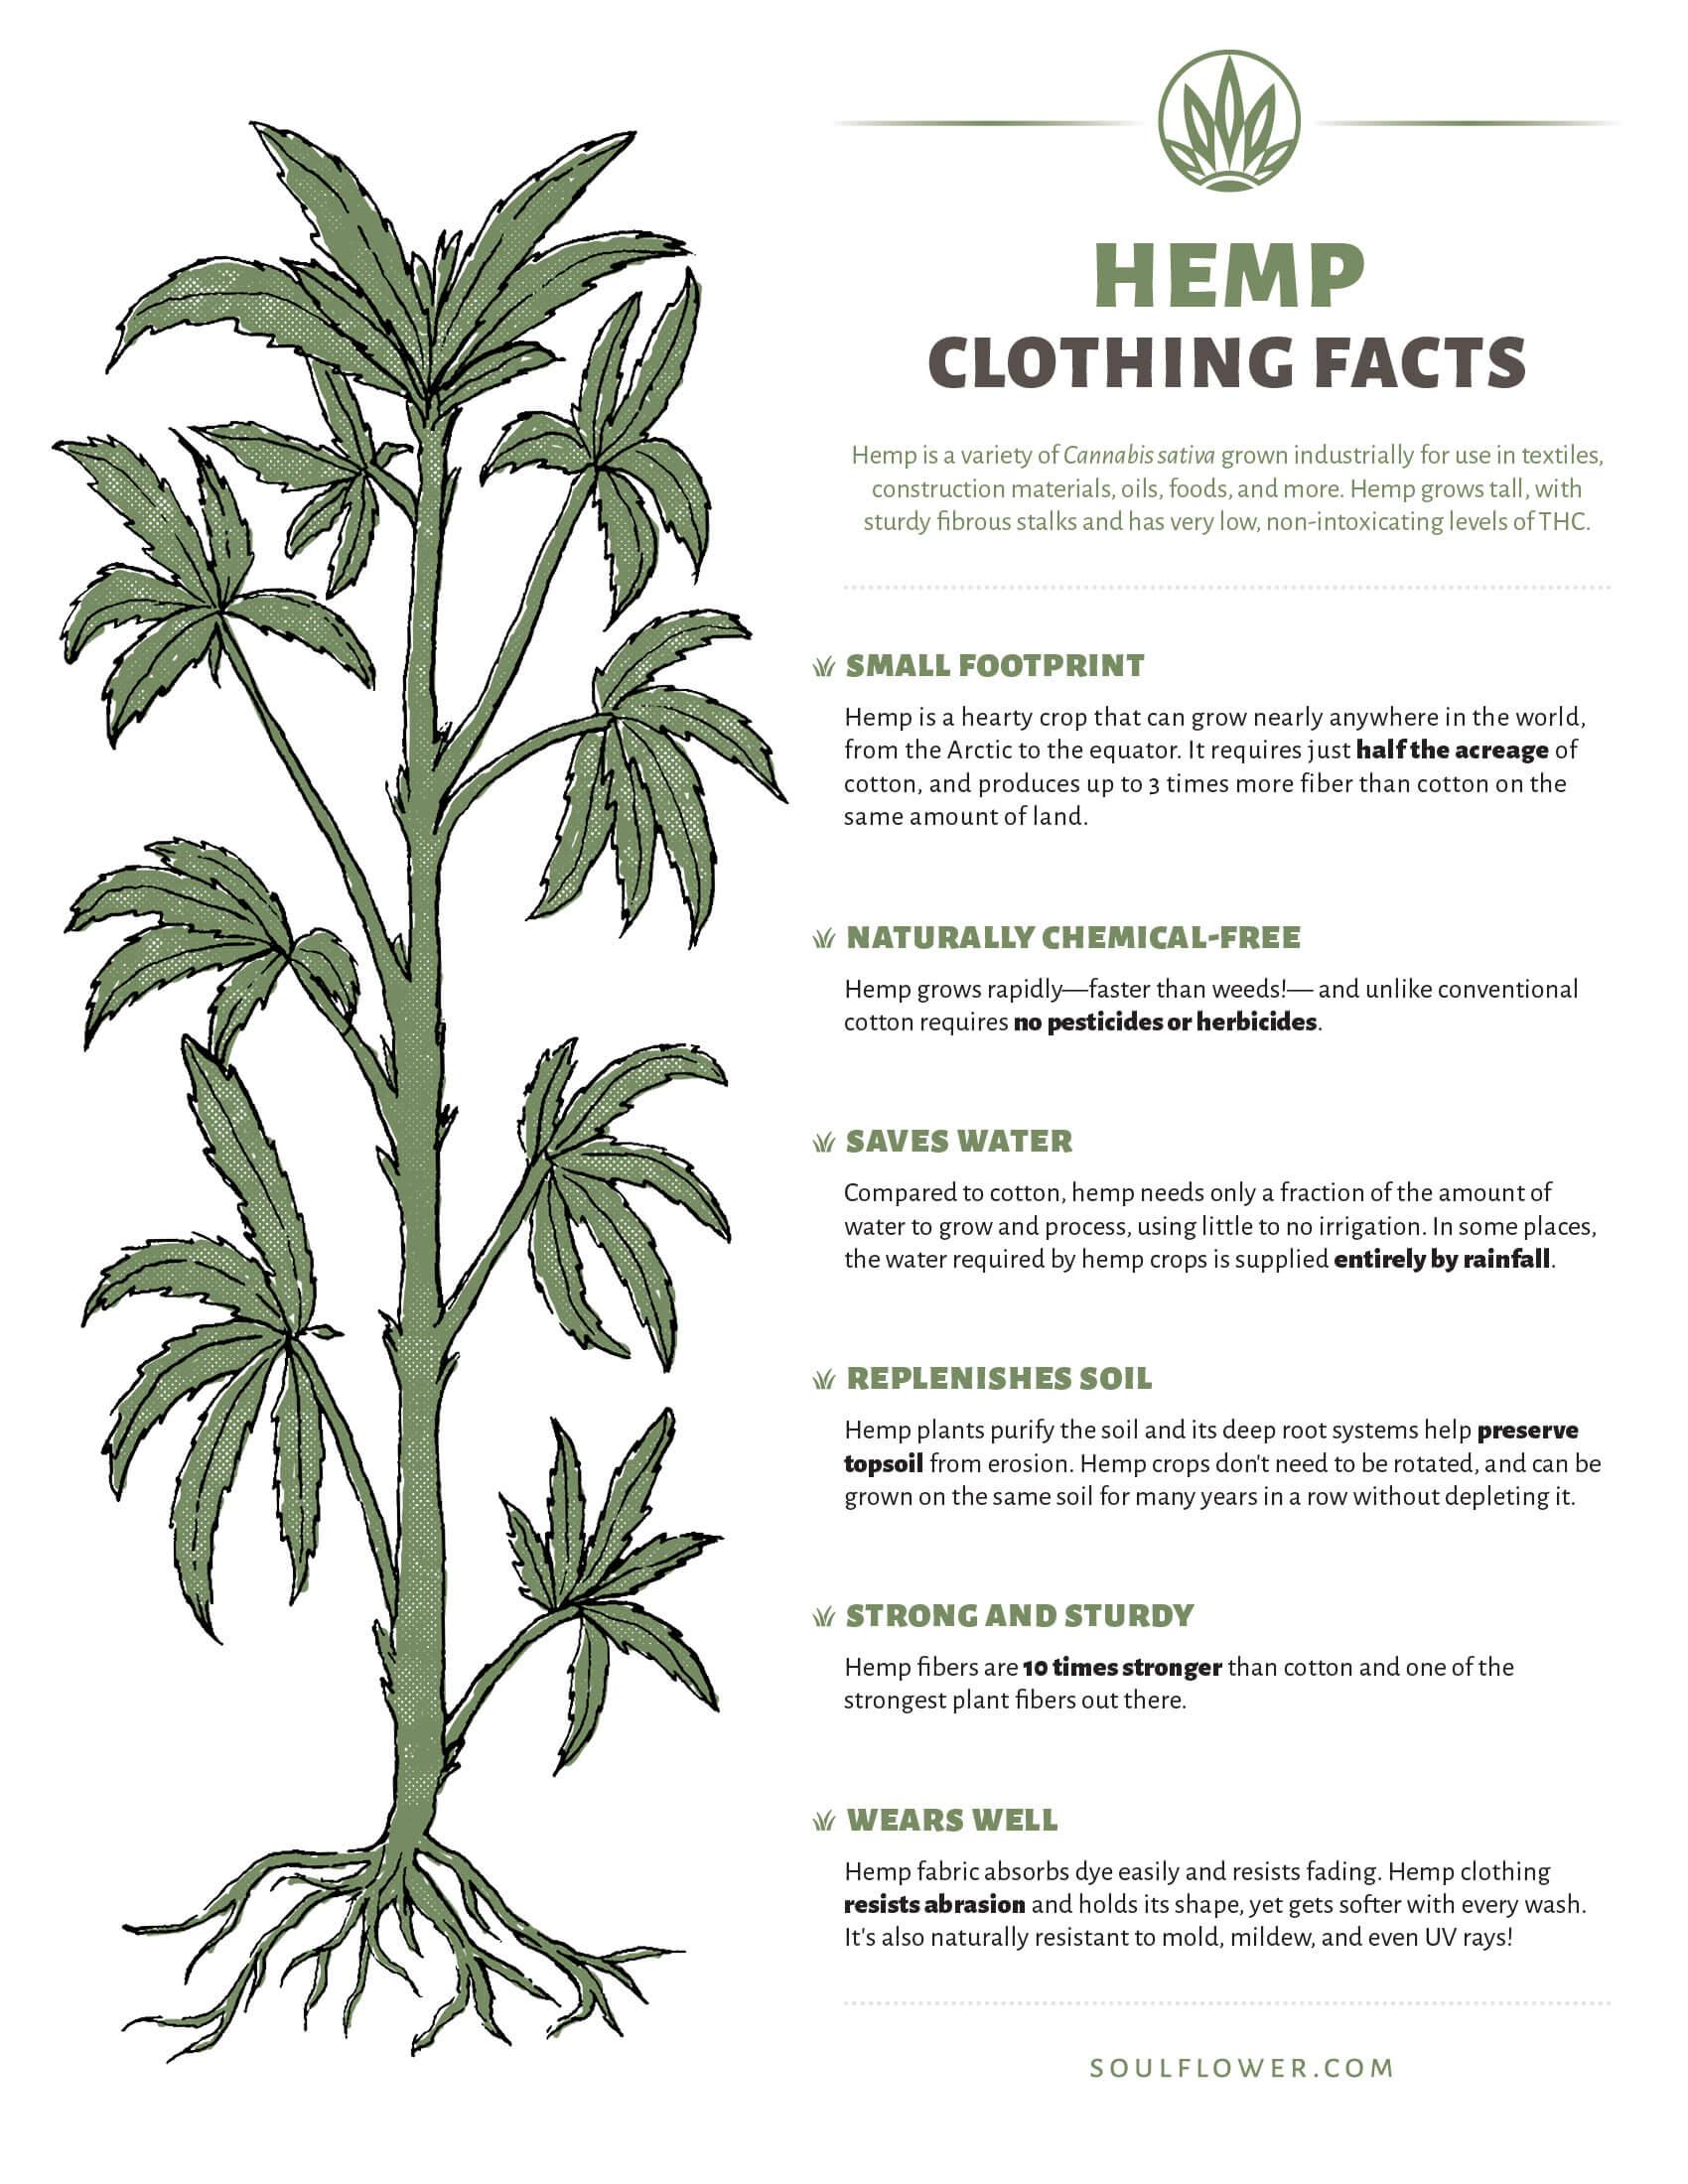 hemp clothing benefits graphic - Hemp Clothing Benefits - A Sustainable Choice!